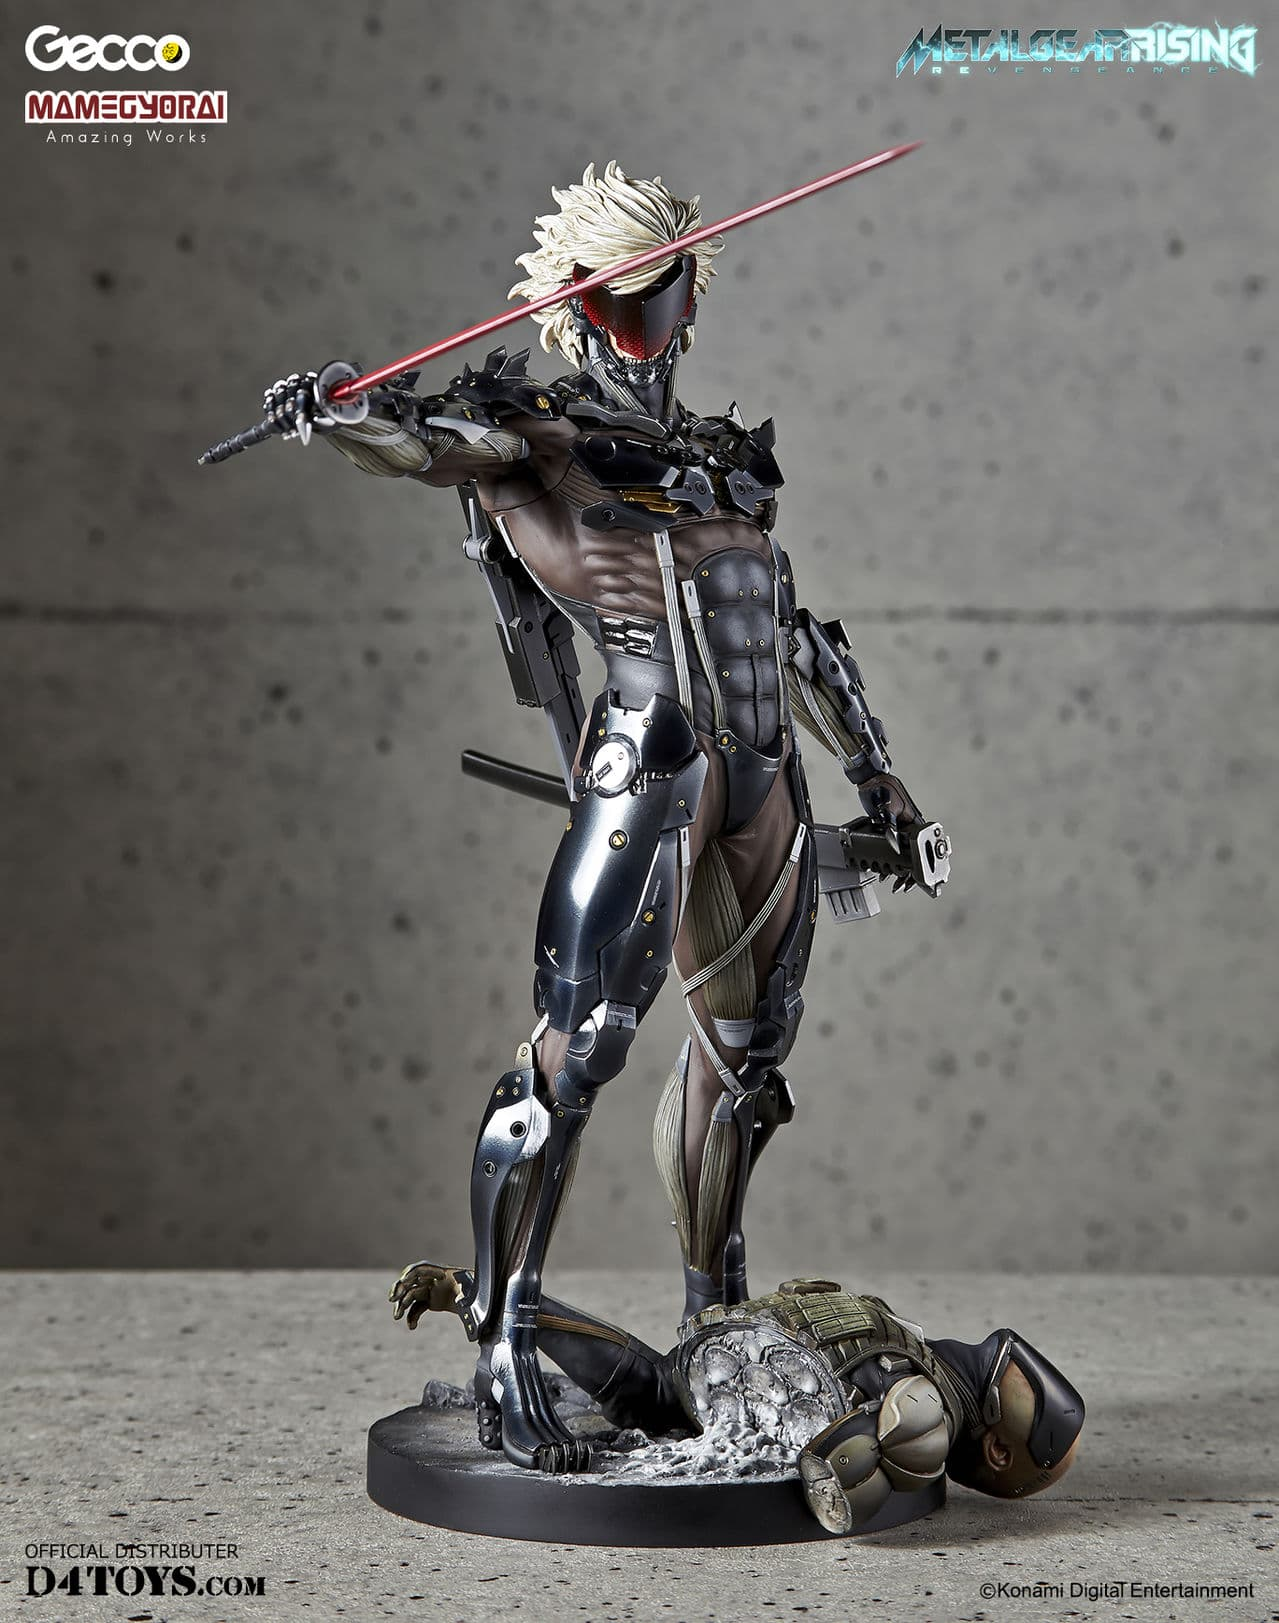 [Gecco,  Mamegyorai] Metal Gear Rising: Revengeance - RAIDEN White Armor 1/6 - SDCC2015 Exclusive - Página 2 D4_b01